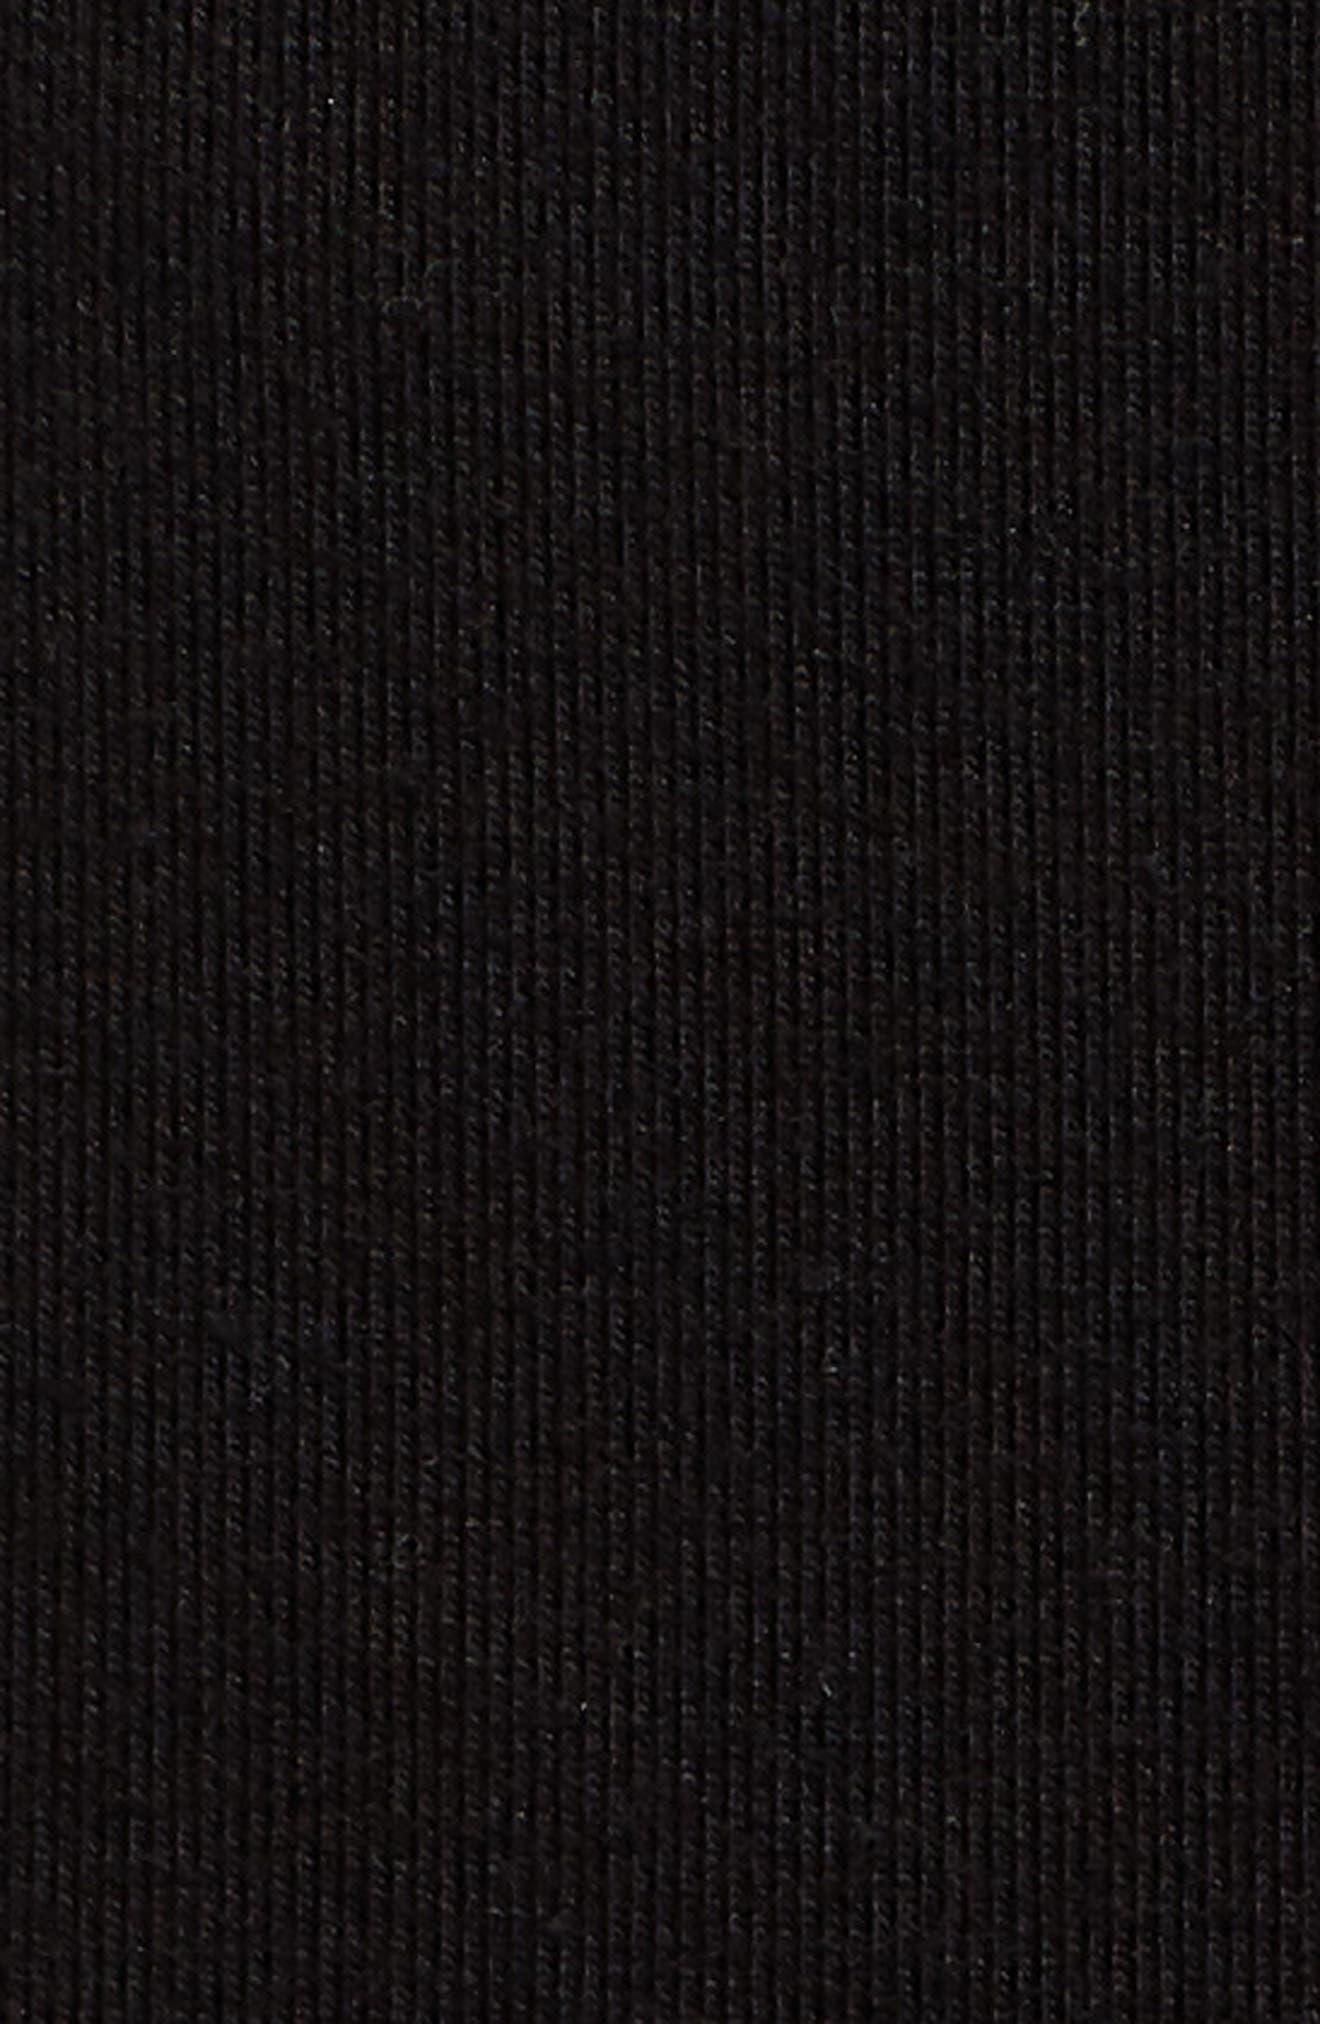 High Waist Crop Leggings,                             Alternate thumbnail 5, color,                             Black